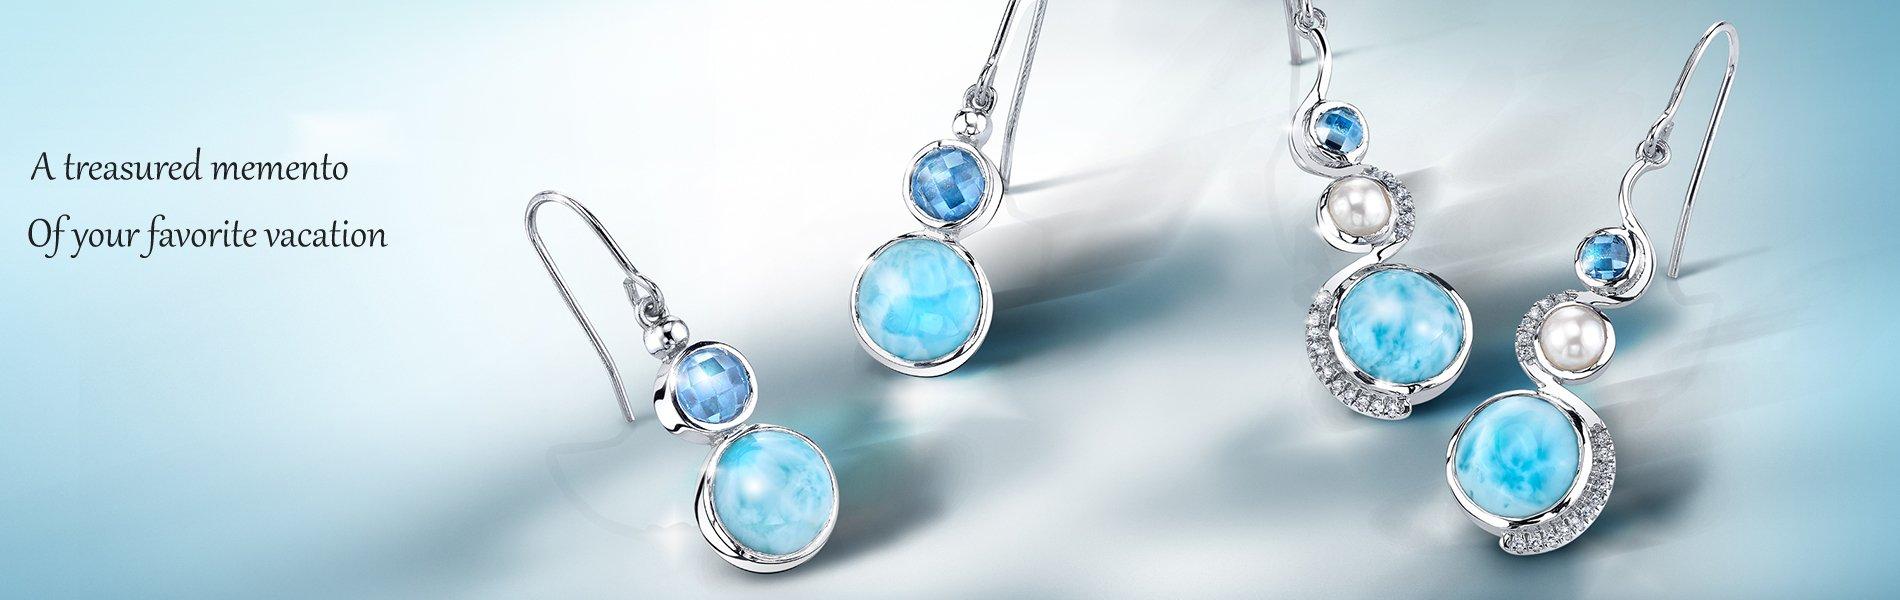 Marahlago Larimar Jewelry Authorized Dealer Larimarket